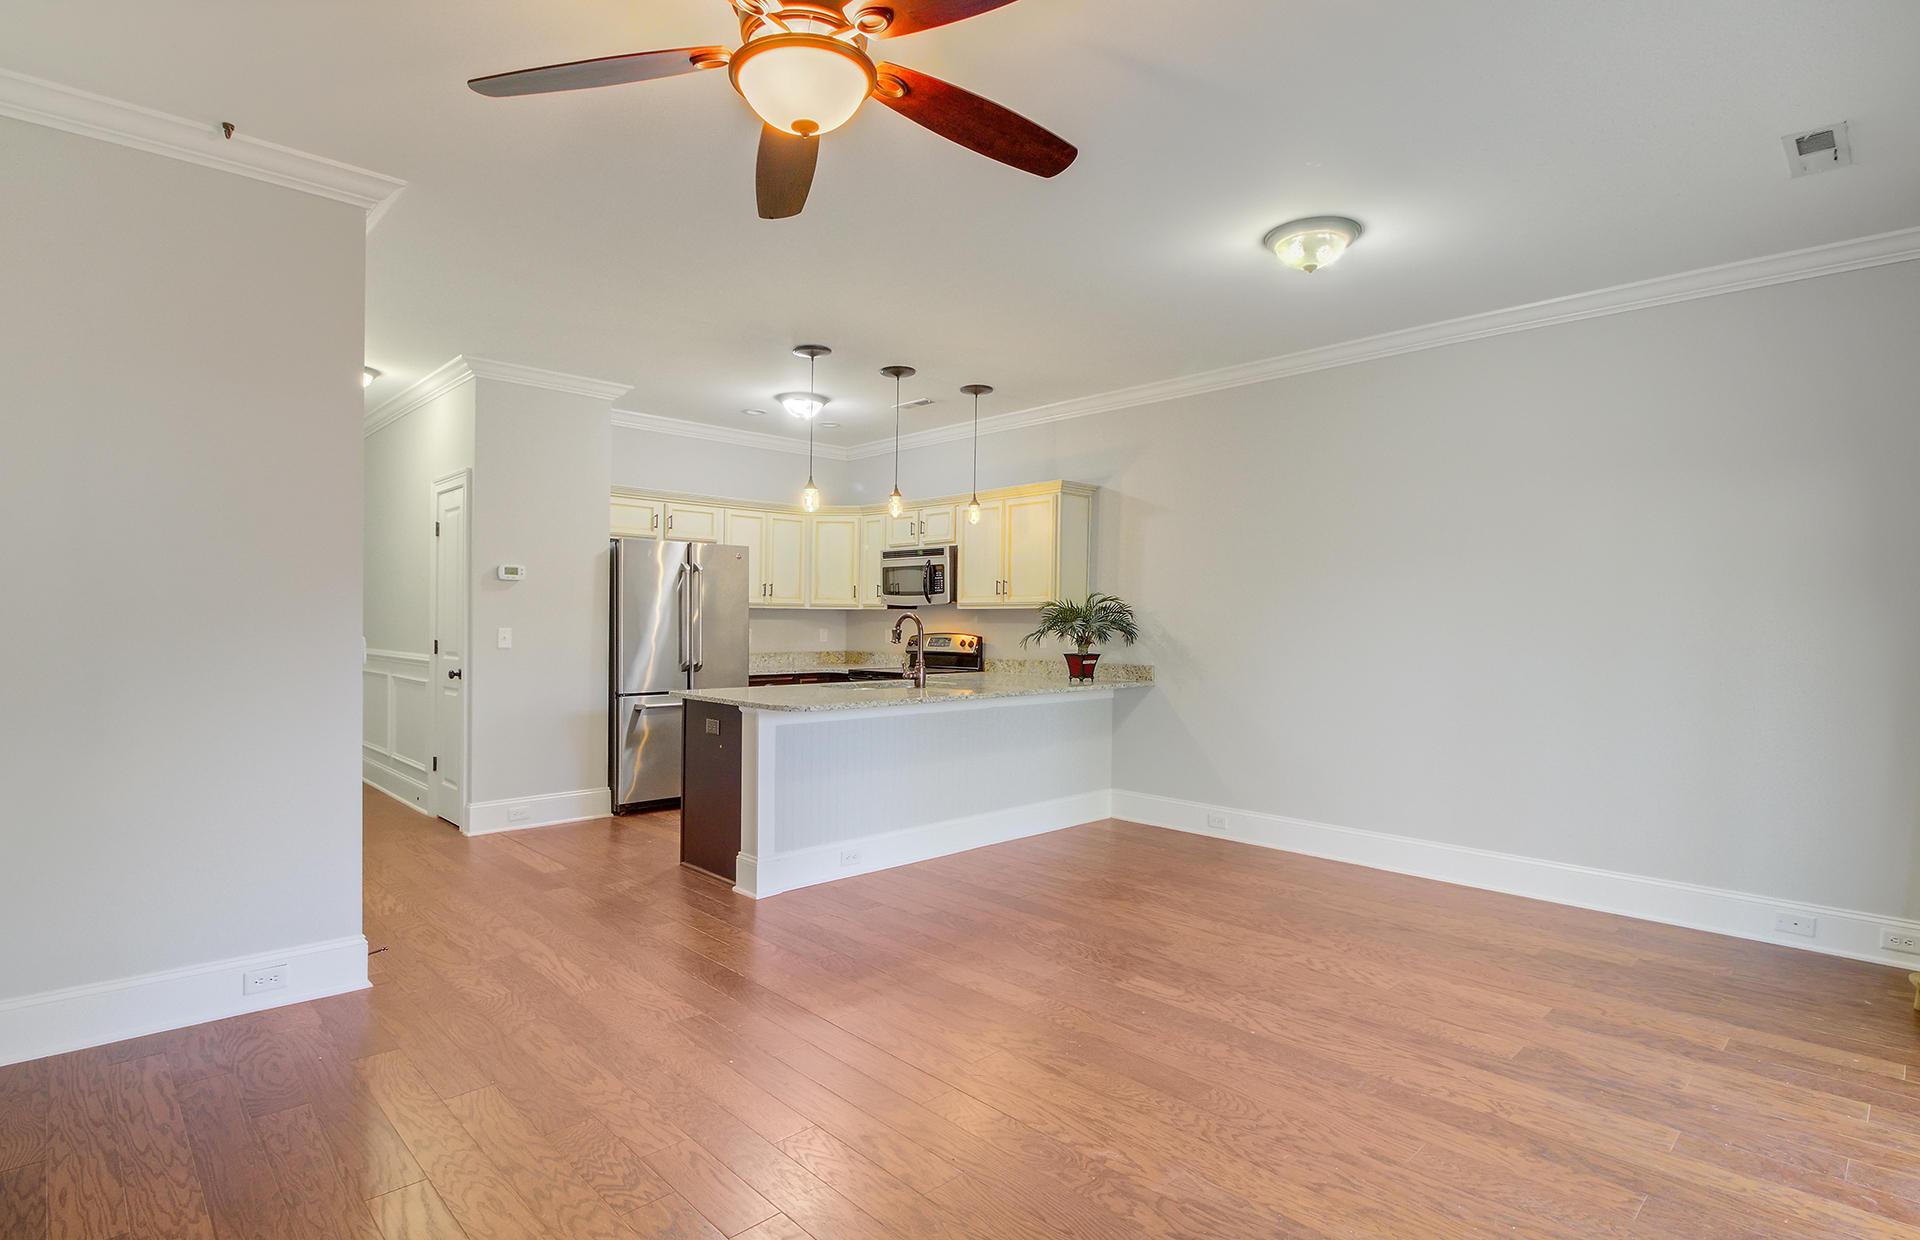 Carol Oaks Town Homes Homes For Sale - 2960 Emma, Mount Pleasant, SC - 6